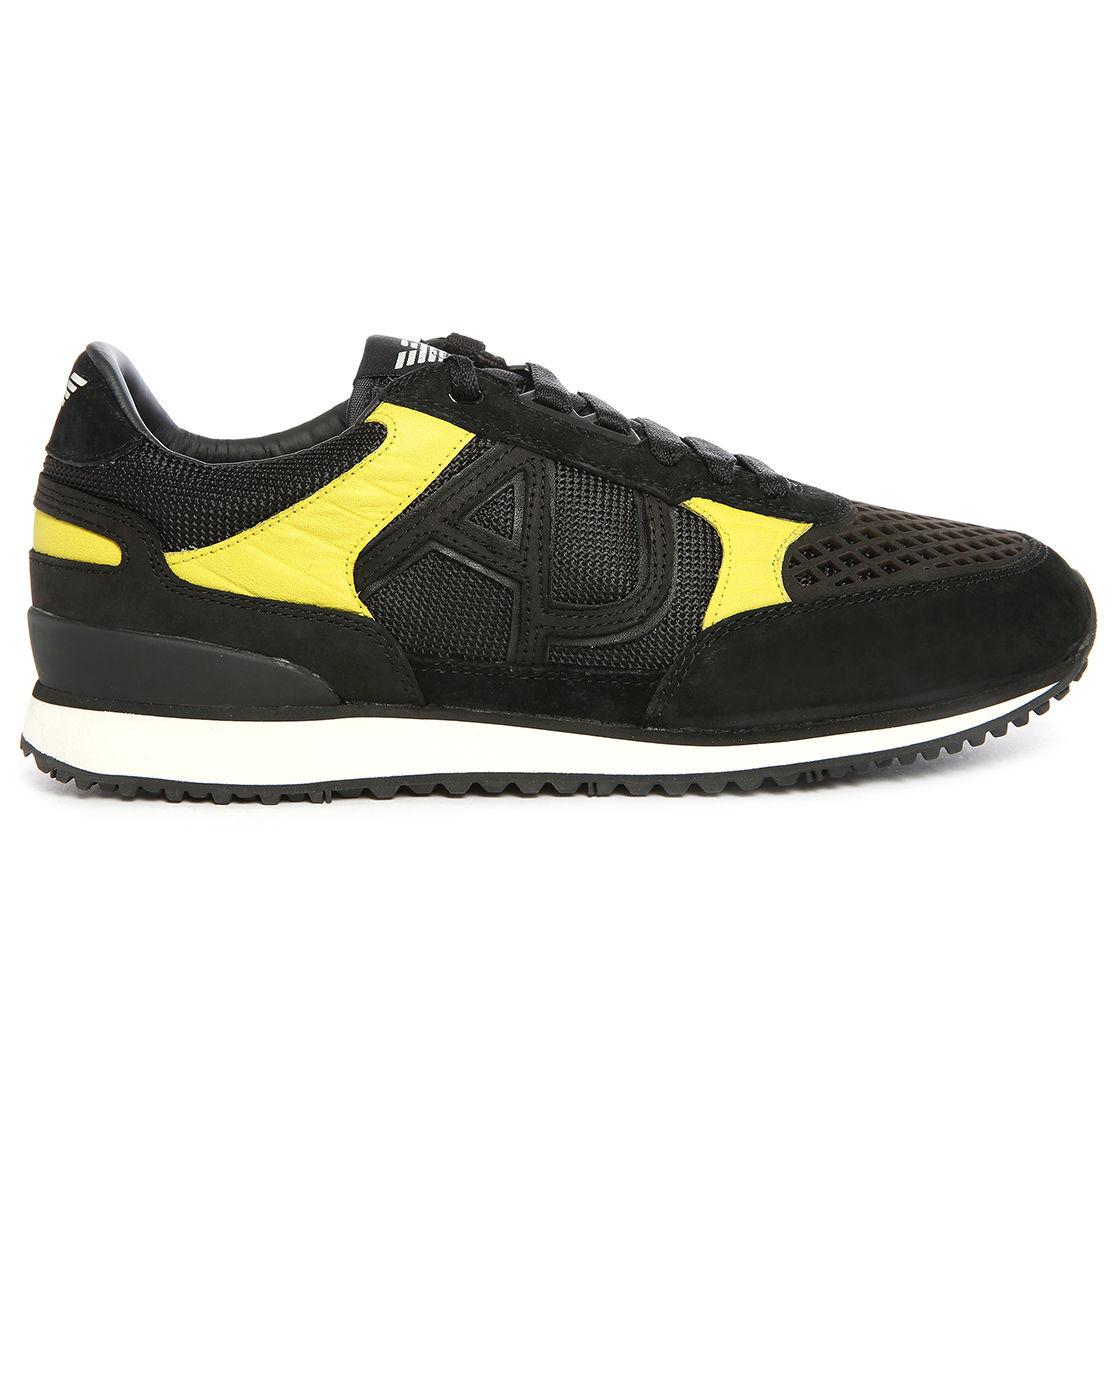 a00d4db72483 armani jeans jacket  n12o3y Armani shoes Yellow